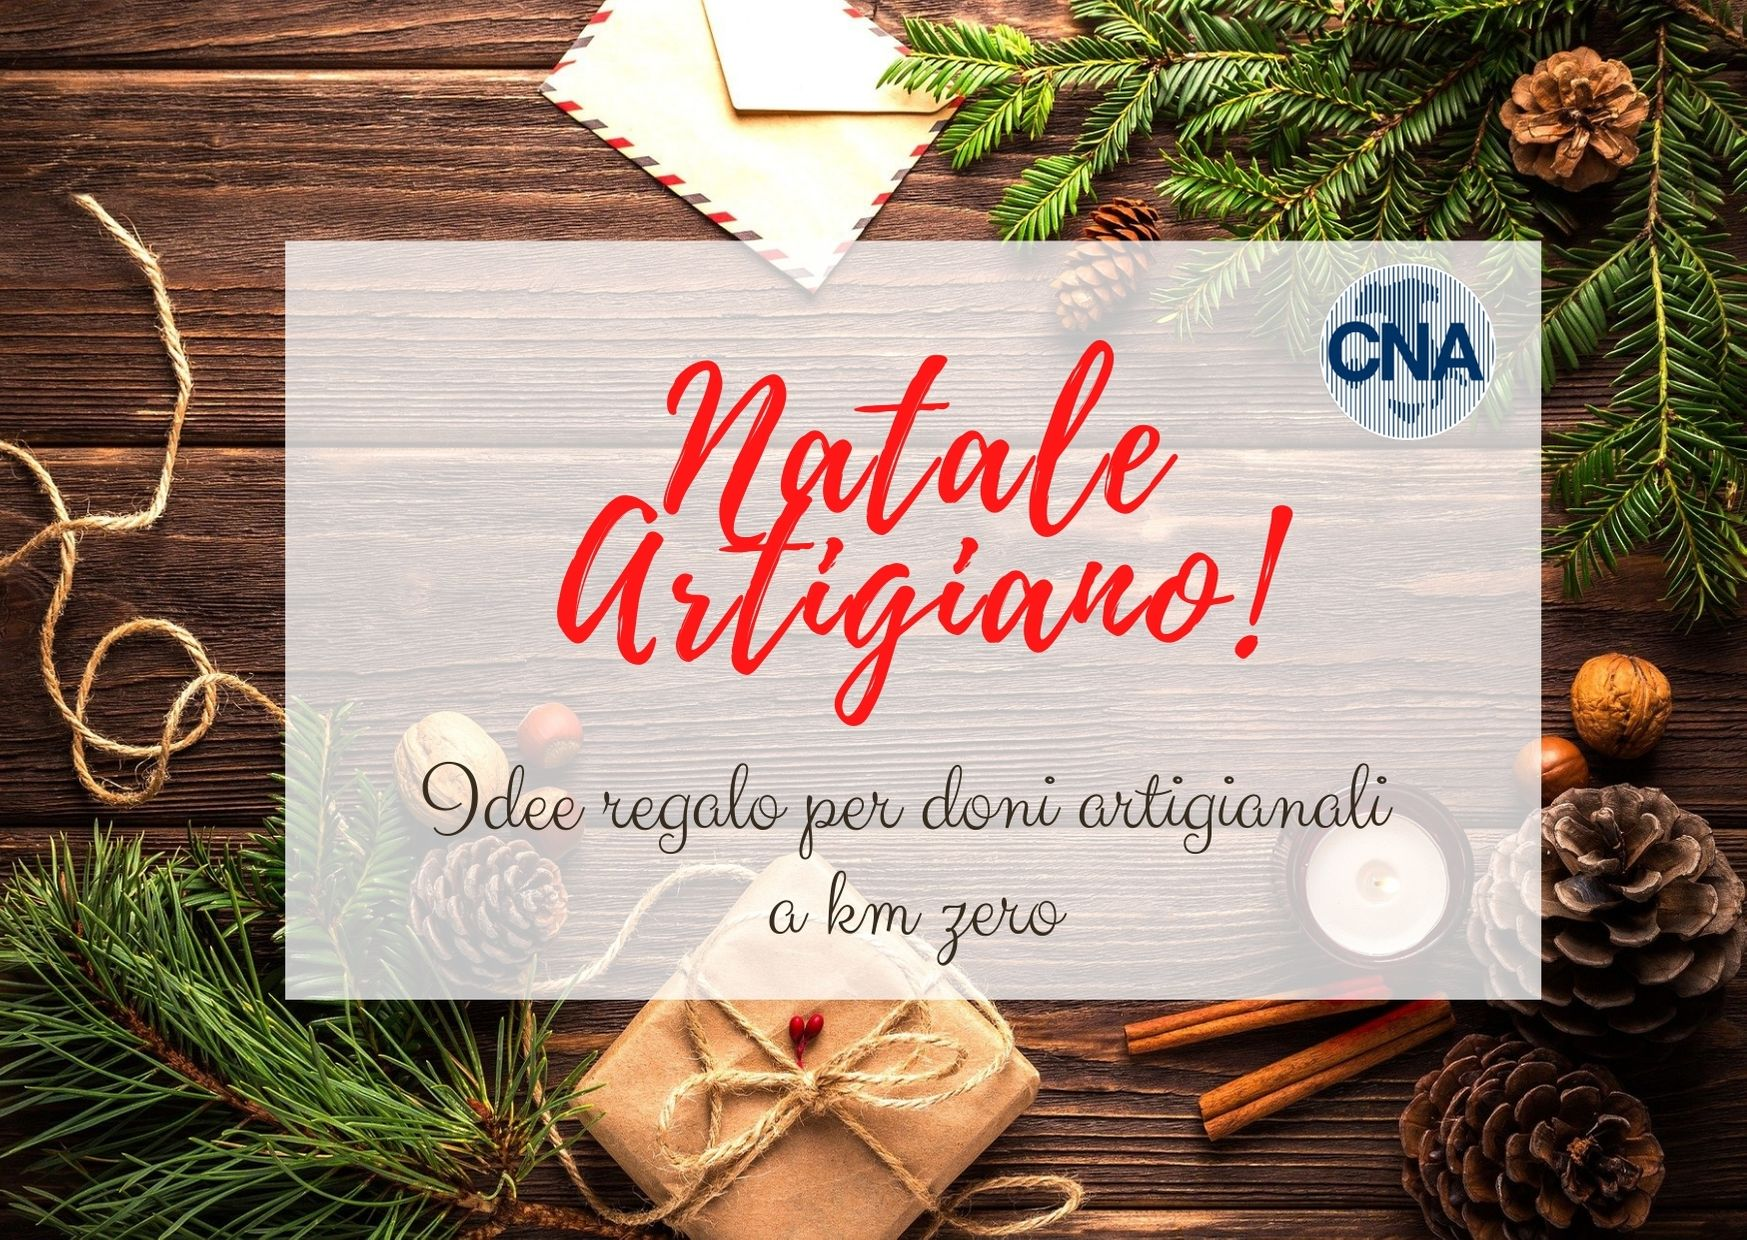 Natale Artigiano con NOI CNA